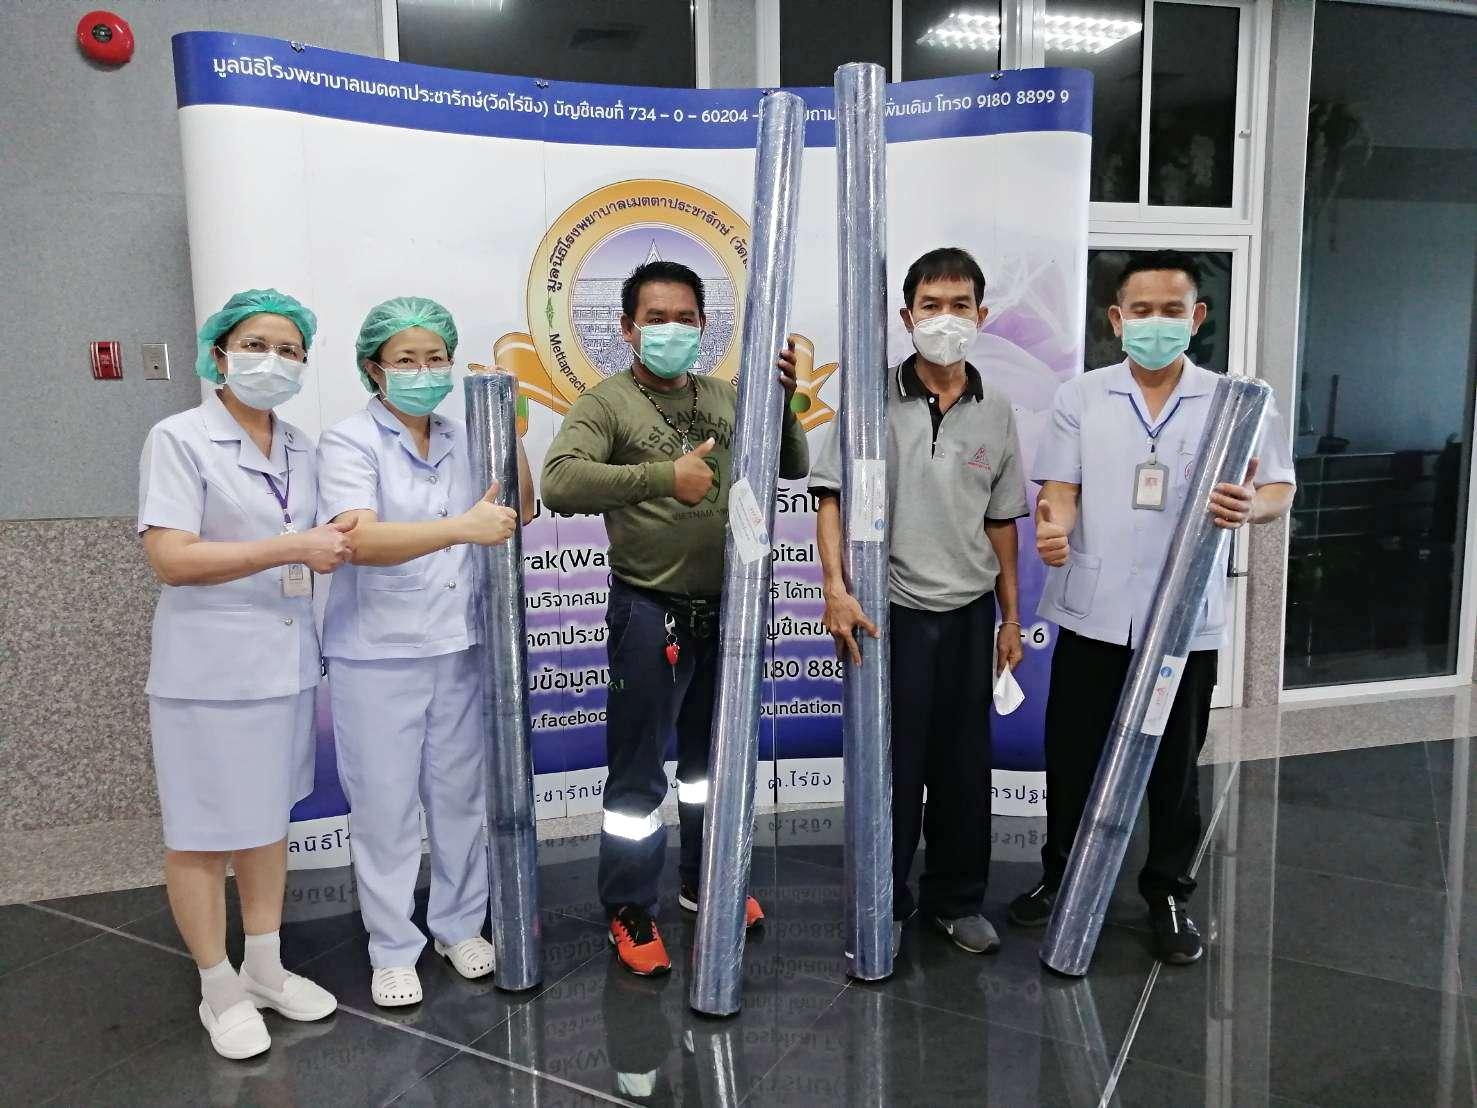 MPI และ ART ร่วมฝ่าวิกฤต Covid 19 มอบพลาสติกใสสำหรับใช้ป้องกันเชื้อโรคให้แก่โรงพยาบาลกว่า 200 แห่ง